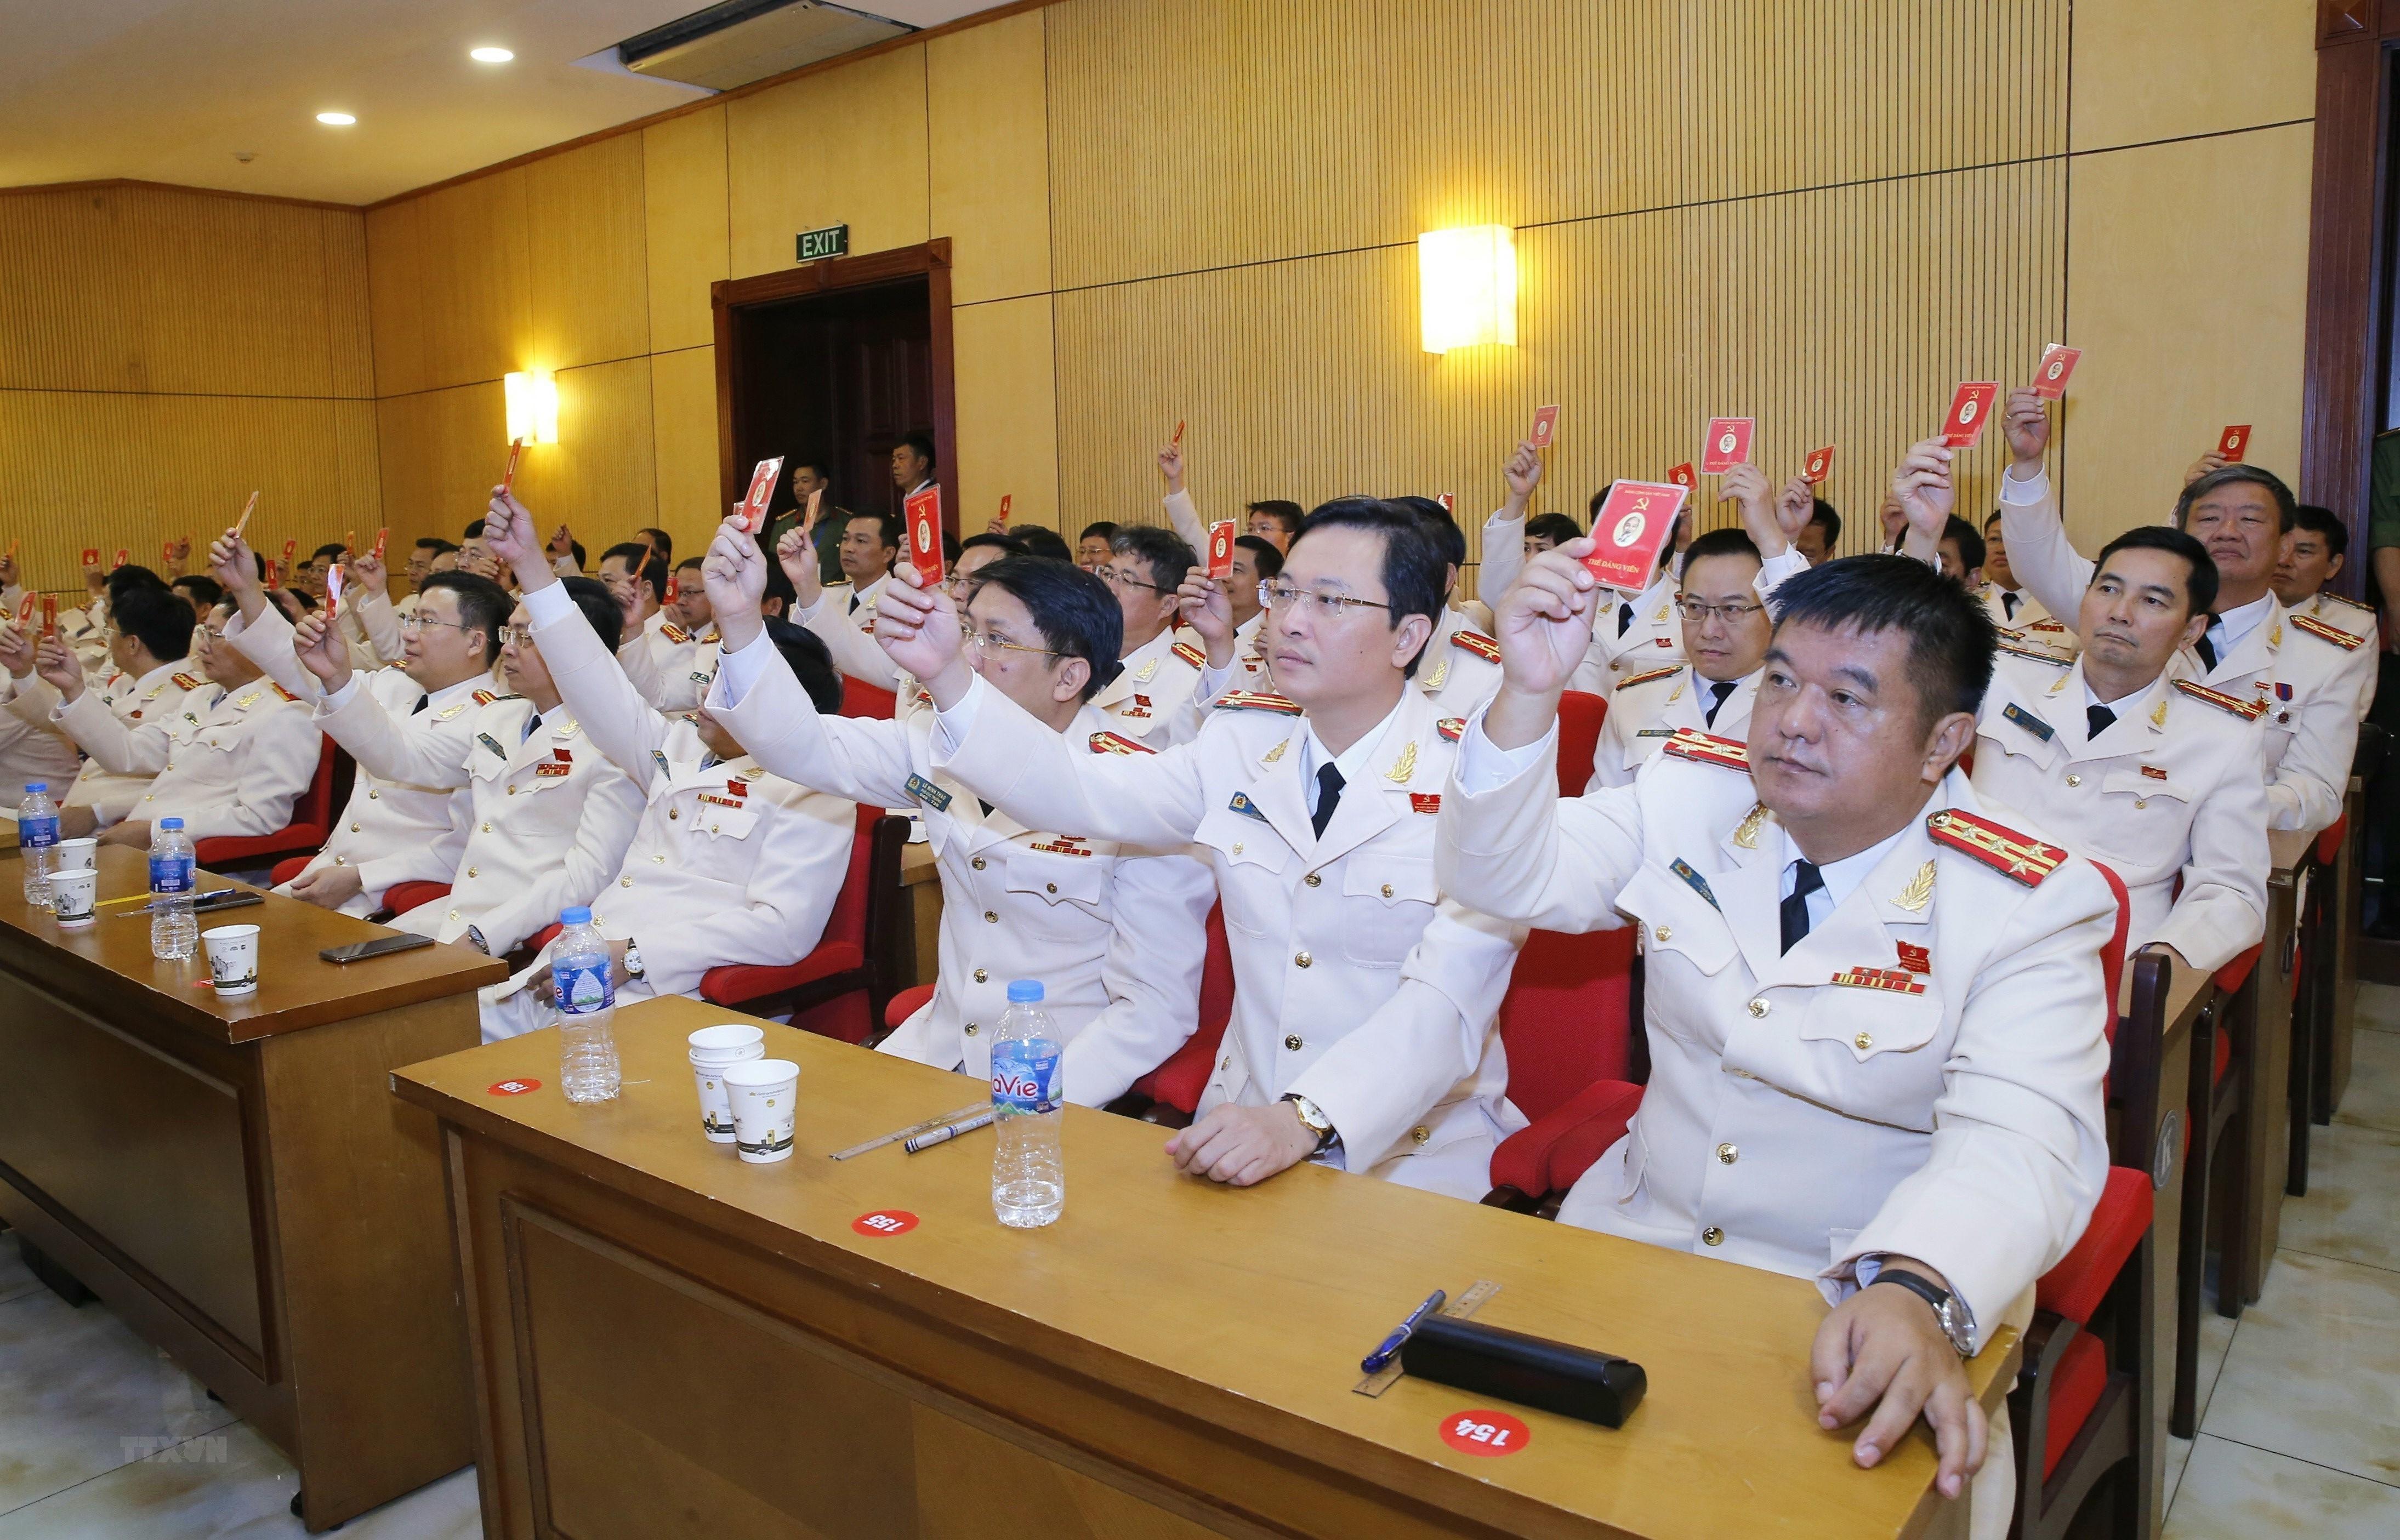 [Photo] Dai hoi dai bieu Dang bo Cong an Trung uong lan thu VII hinh anh 2